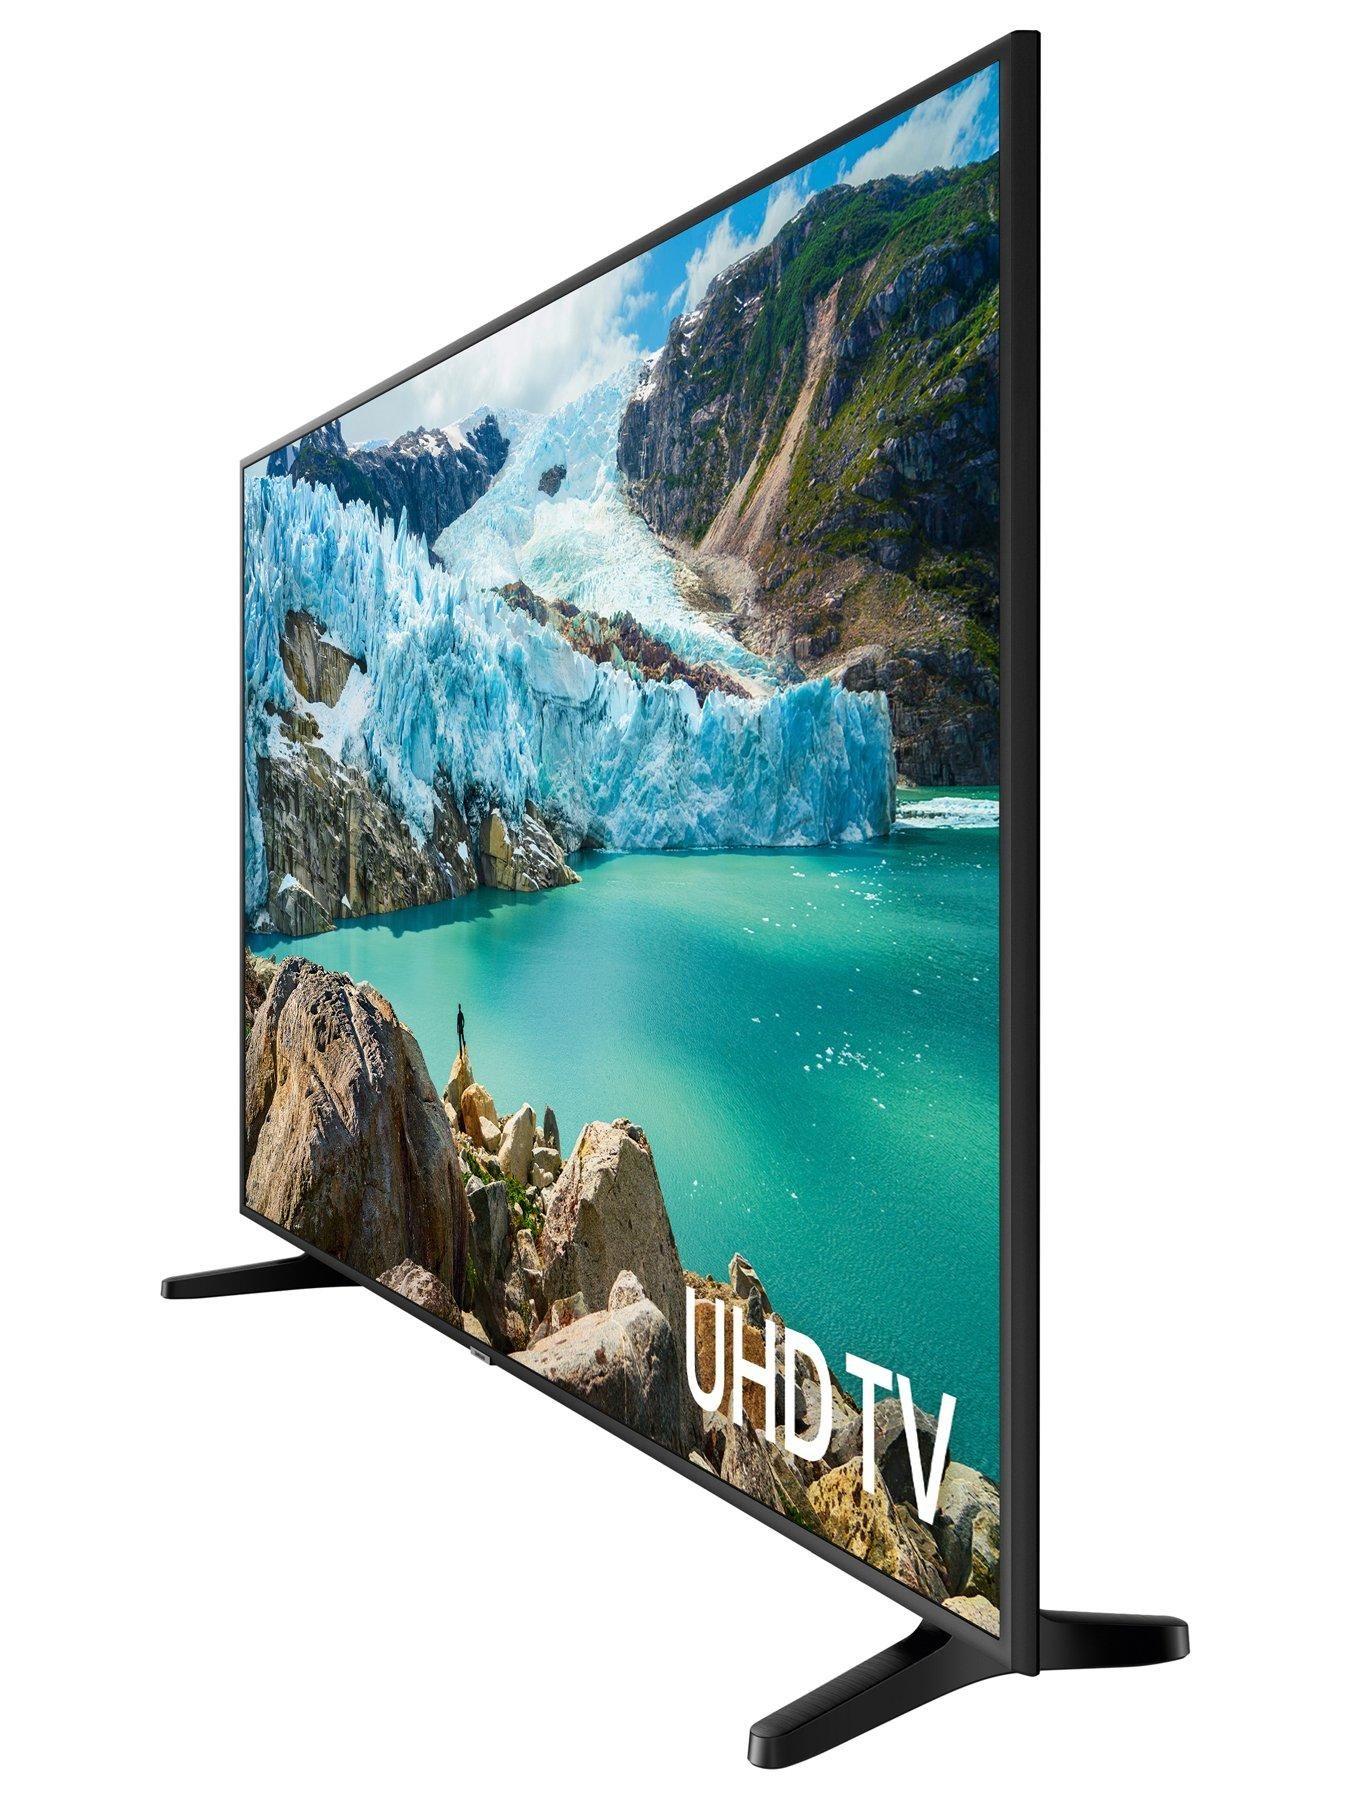 Samsung Samsung UE55RU7020KXXU 55 inch HDR Smart 4K TV